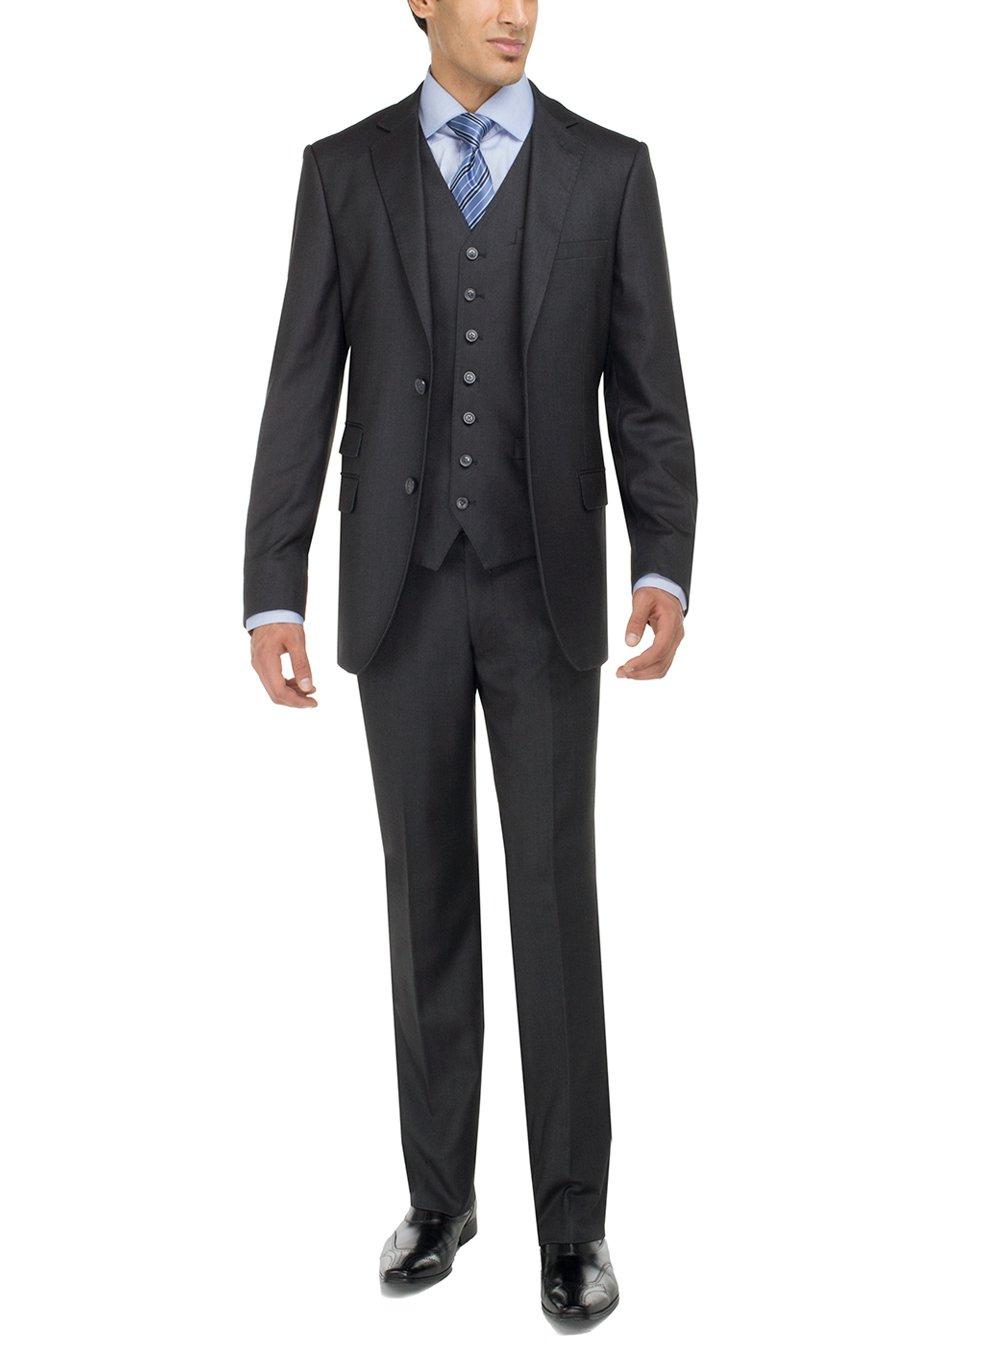 Luciano Natazzi Men's Two Button Bird's Eye 3 Piece Modern Fit Vested Suit (38 Regular US / 48 Regular EU, Charcoal)